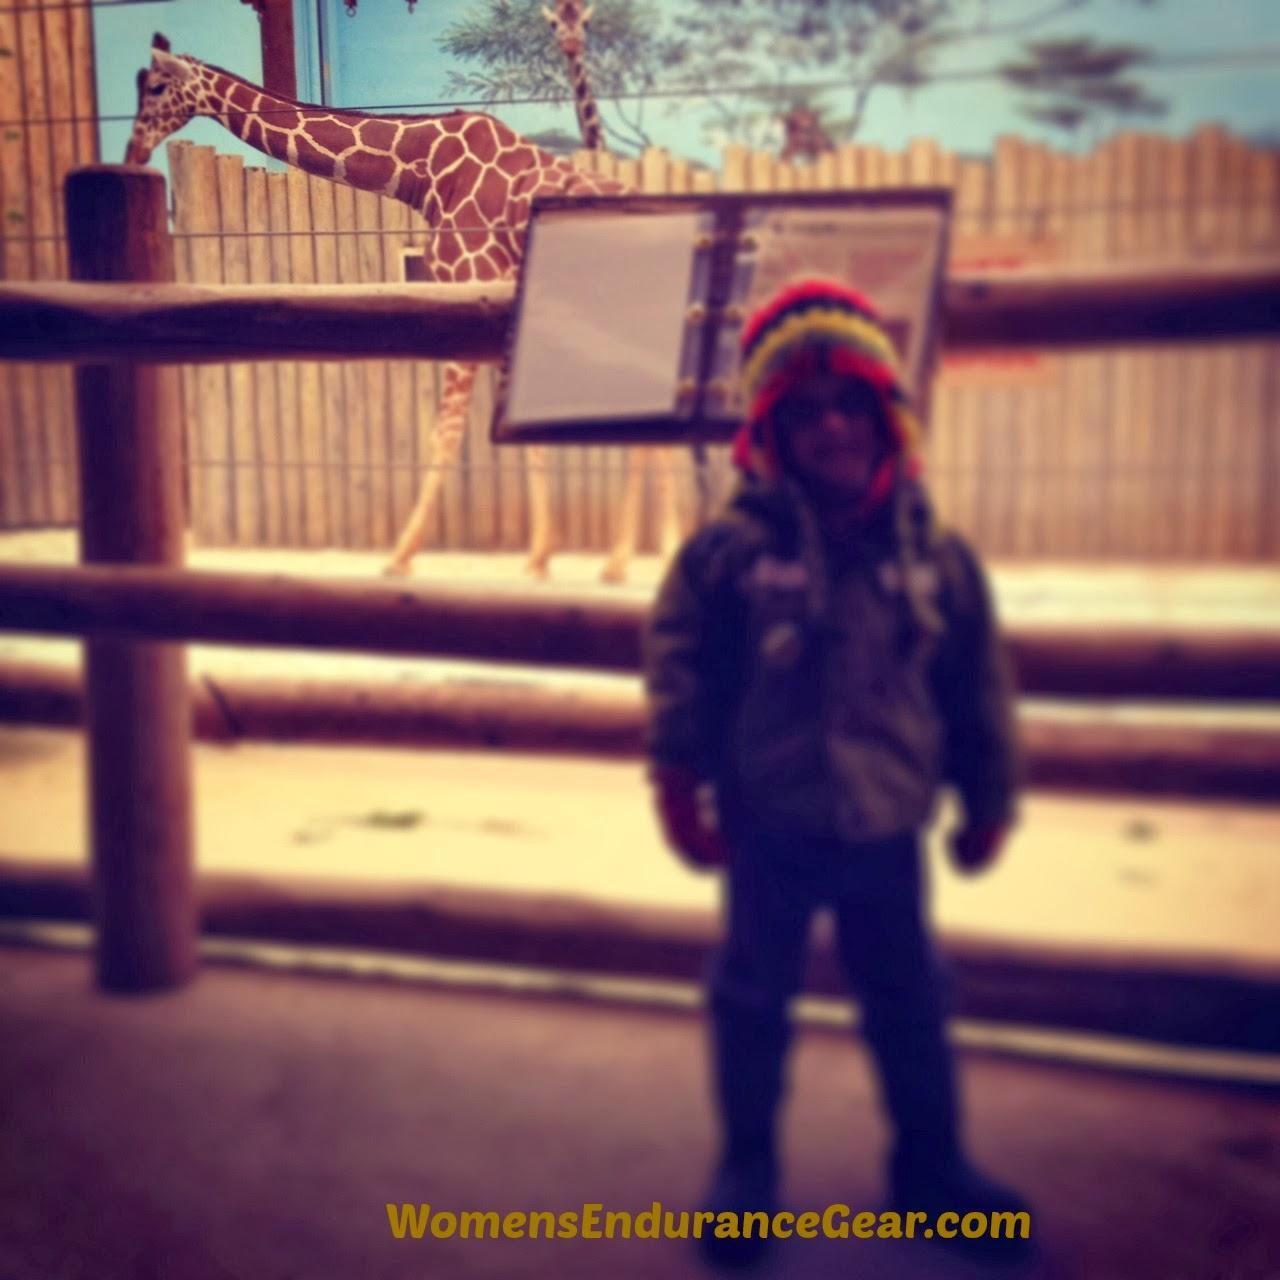 Giraffes at Brookfield Zoo